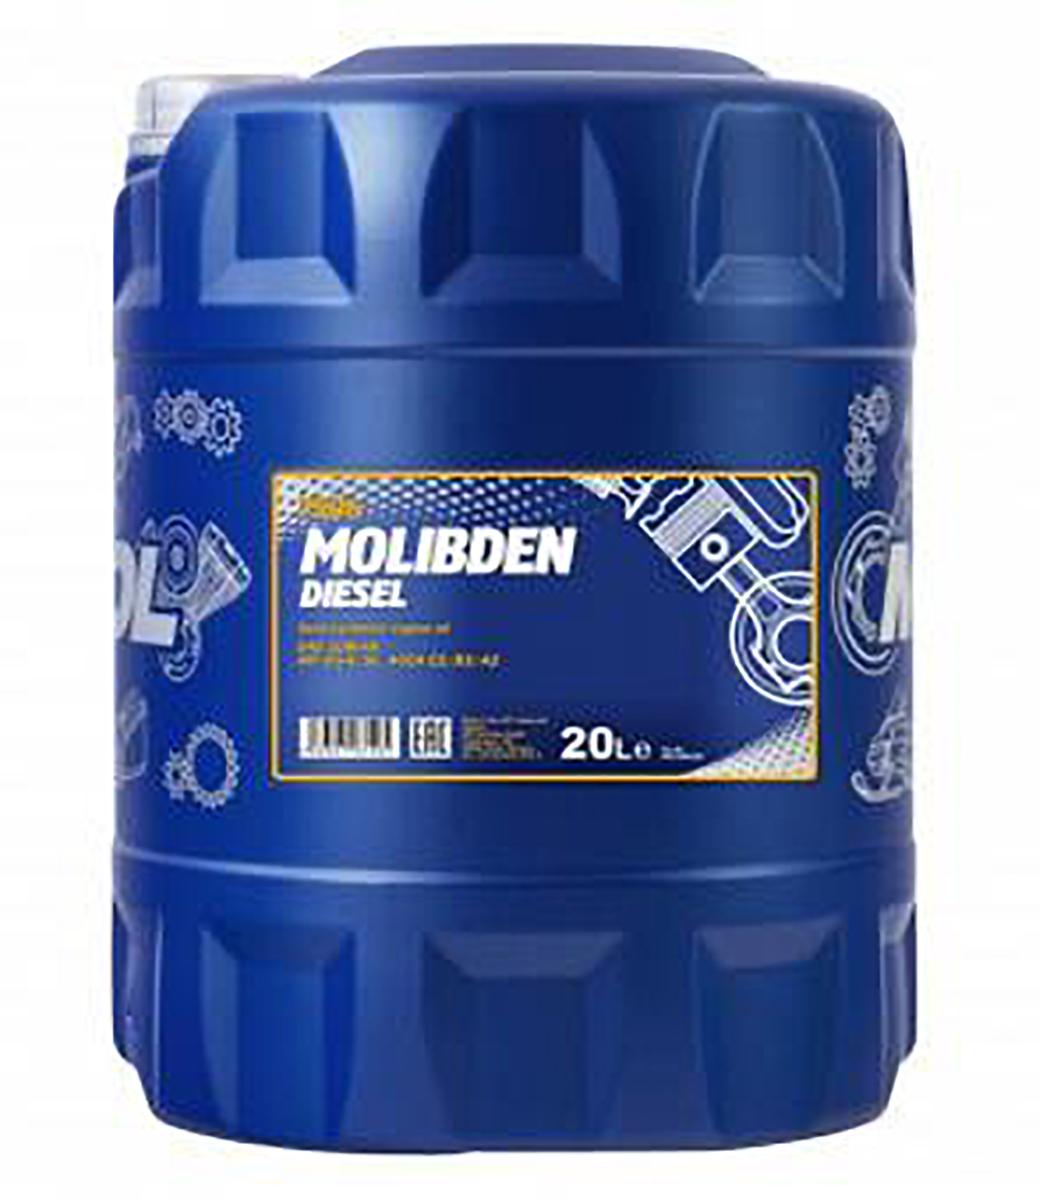 Molibden Diesel 10W-40